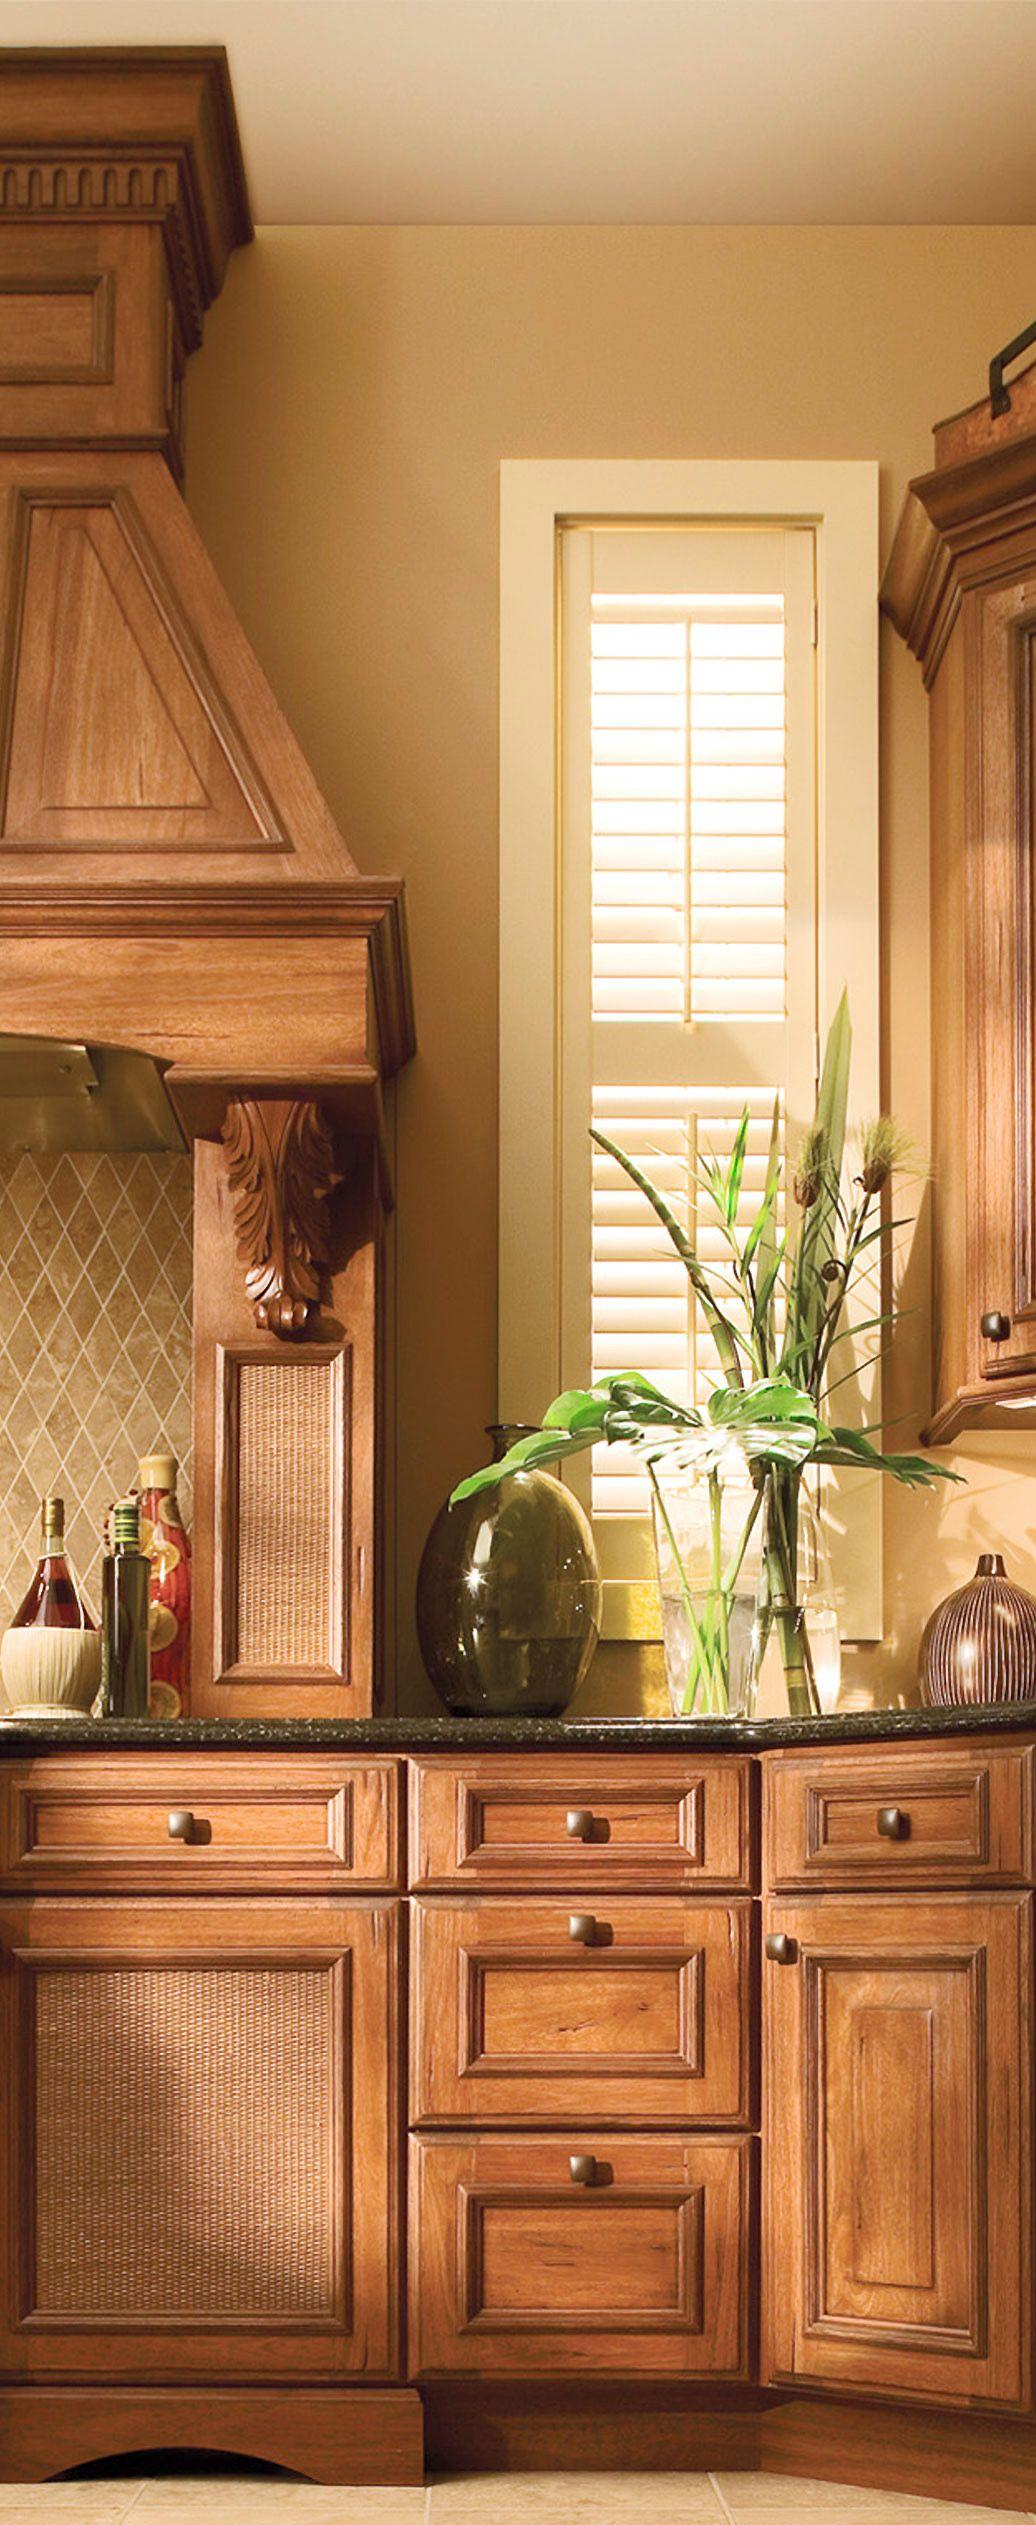 Tropical Kitchen Decor: Tropical Kitchen Decor, Tropical